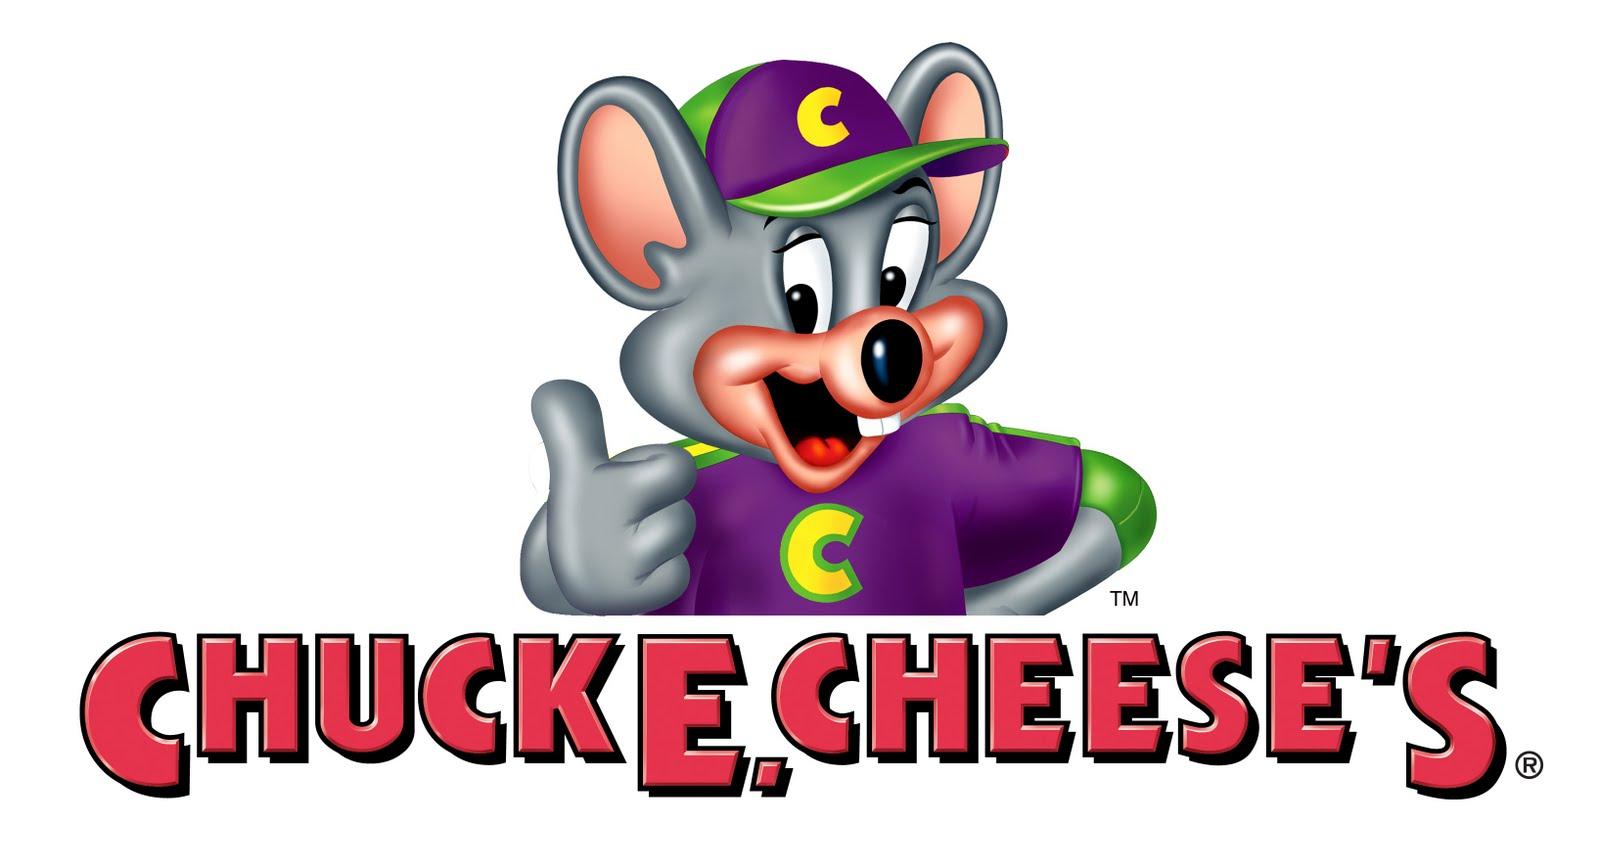 FULL WALLPAPER: Chuck E Cheese